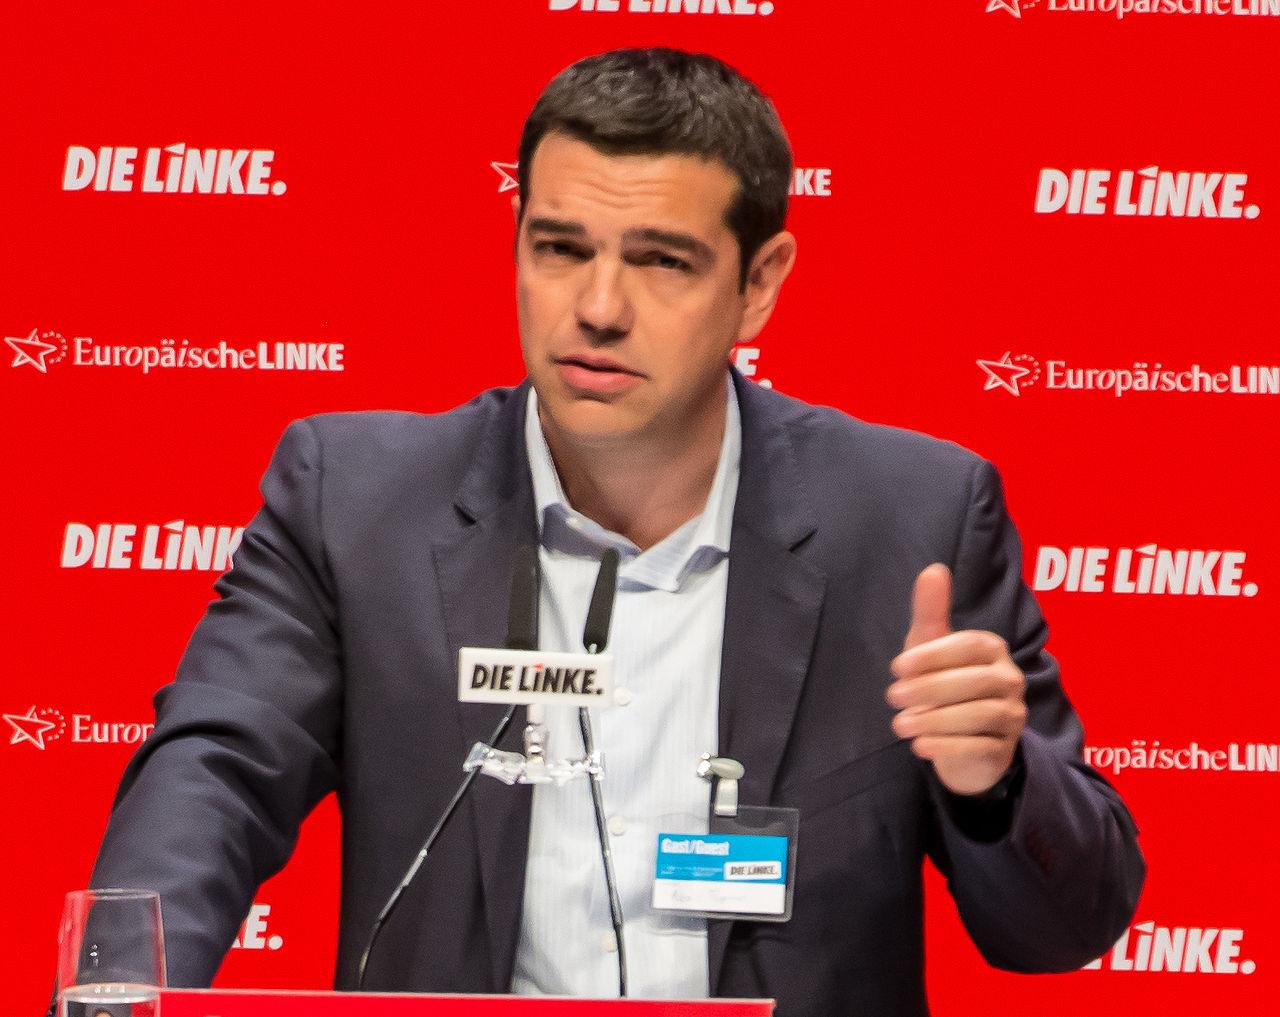 DIE LINKE Bundesparteitag 10. Mai 2014-100.jpg